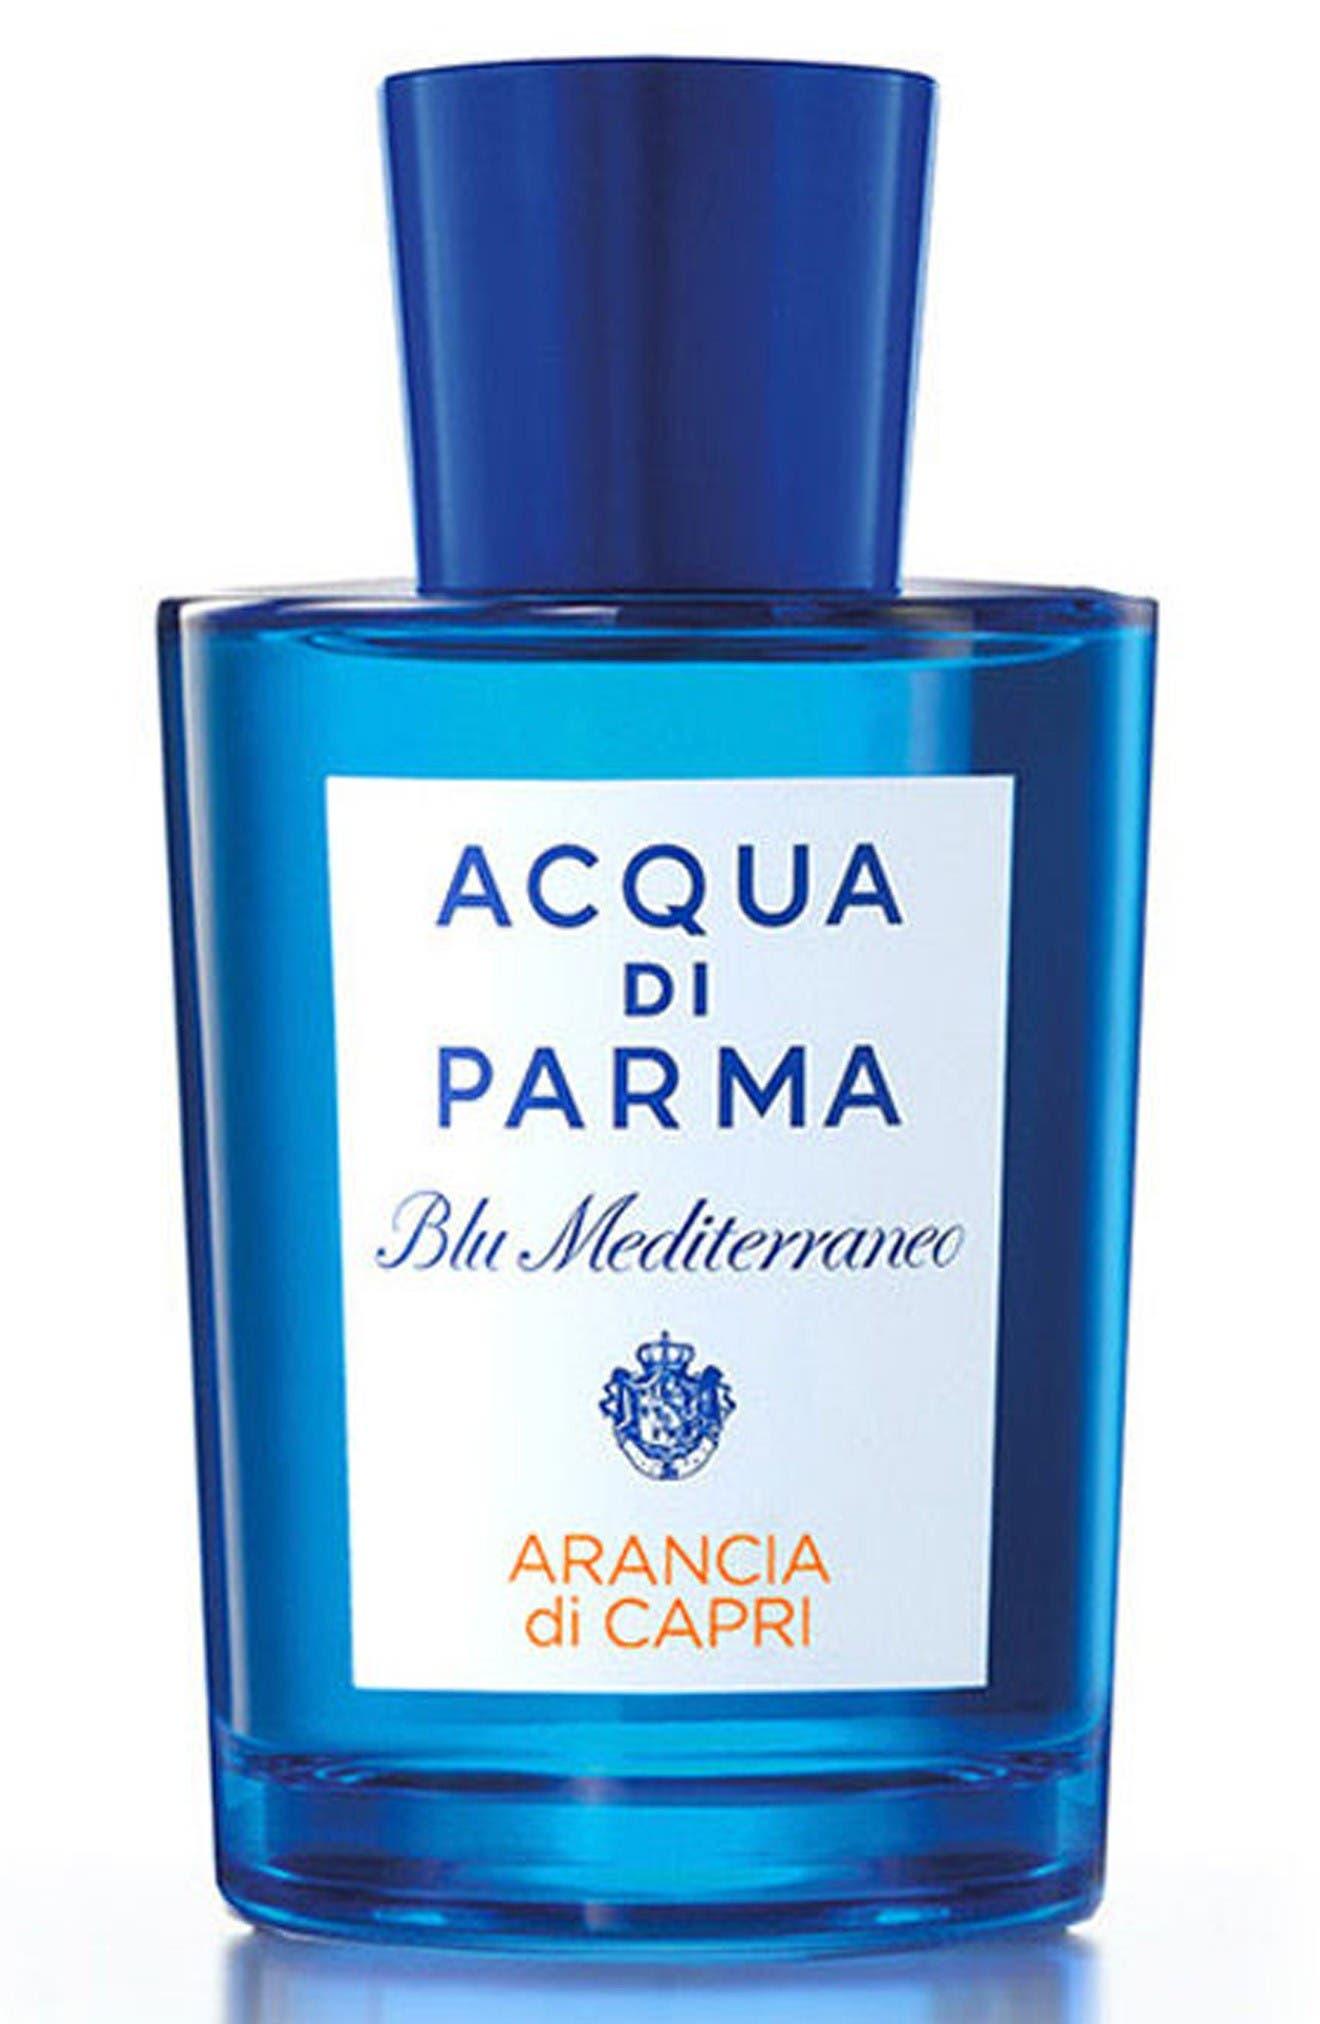 Alternate Image 1 Selected - Acqua di Parma Blu Mediterraneo Arancia di Capri Eau de Toilette